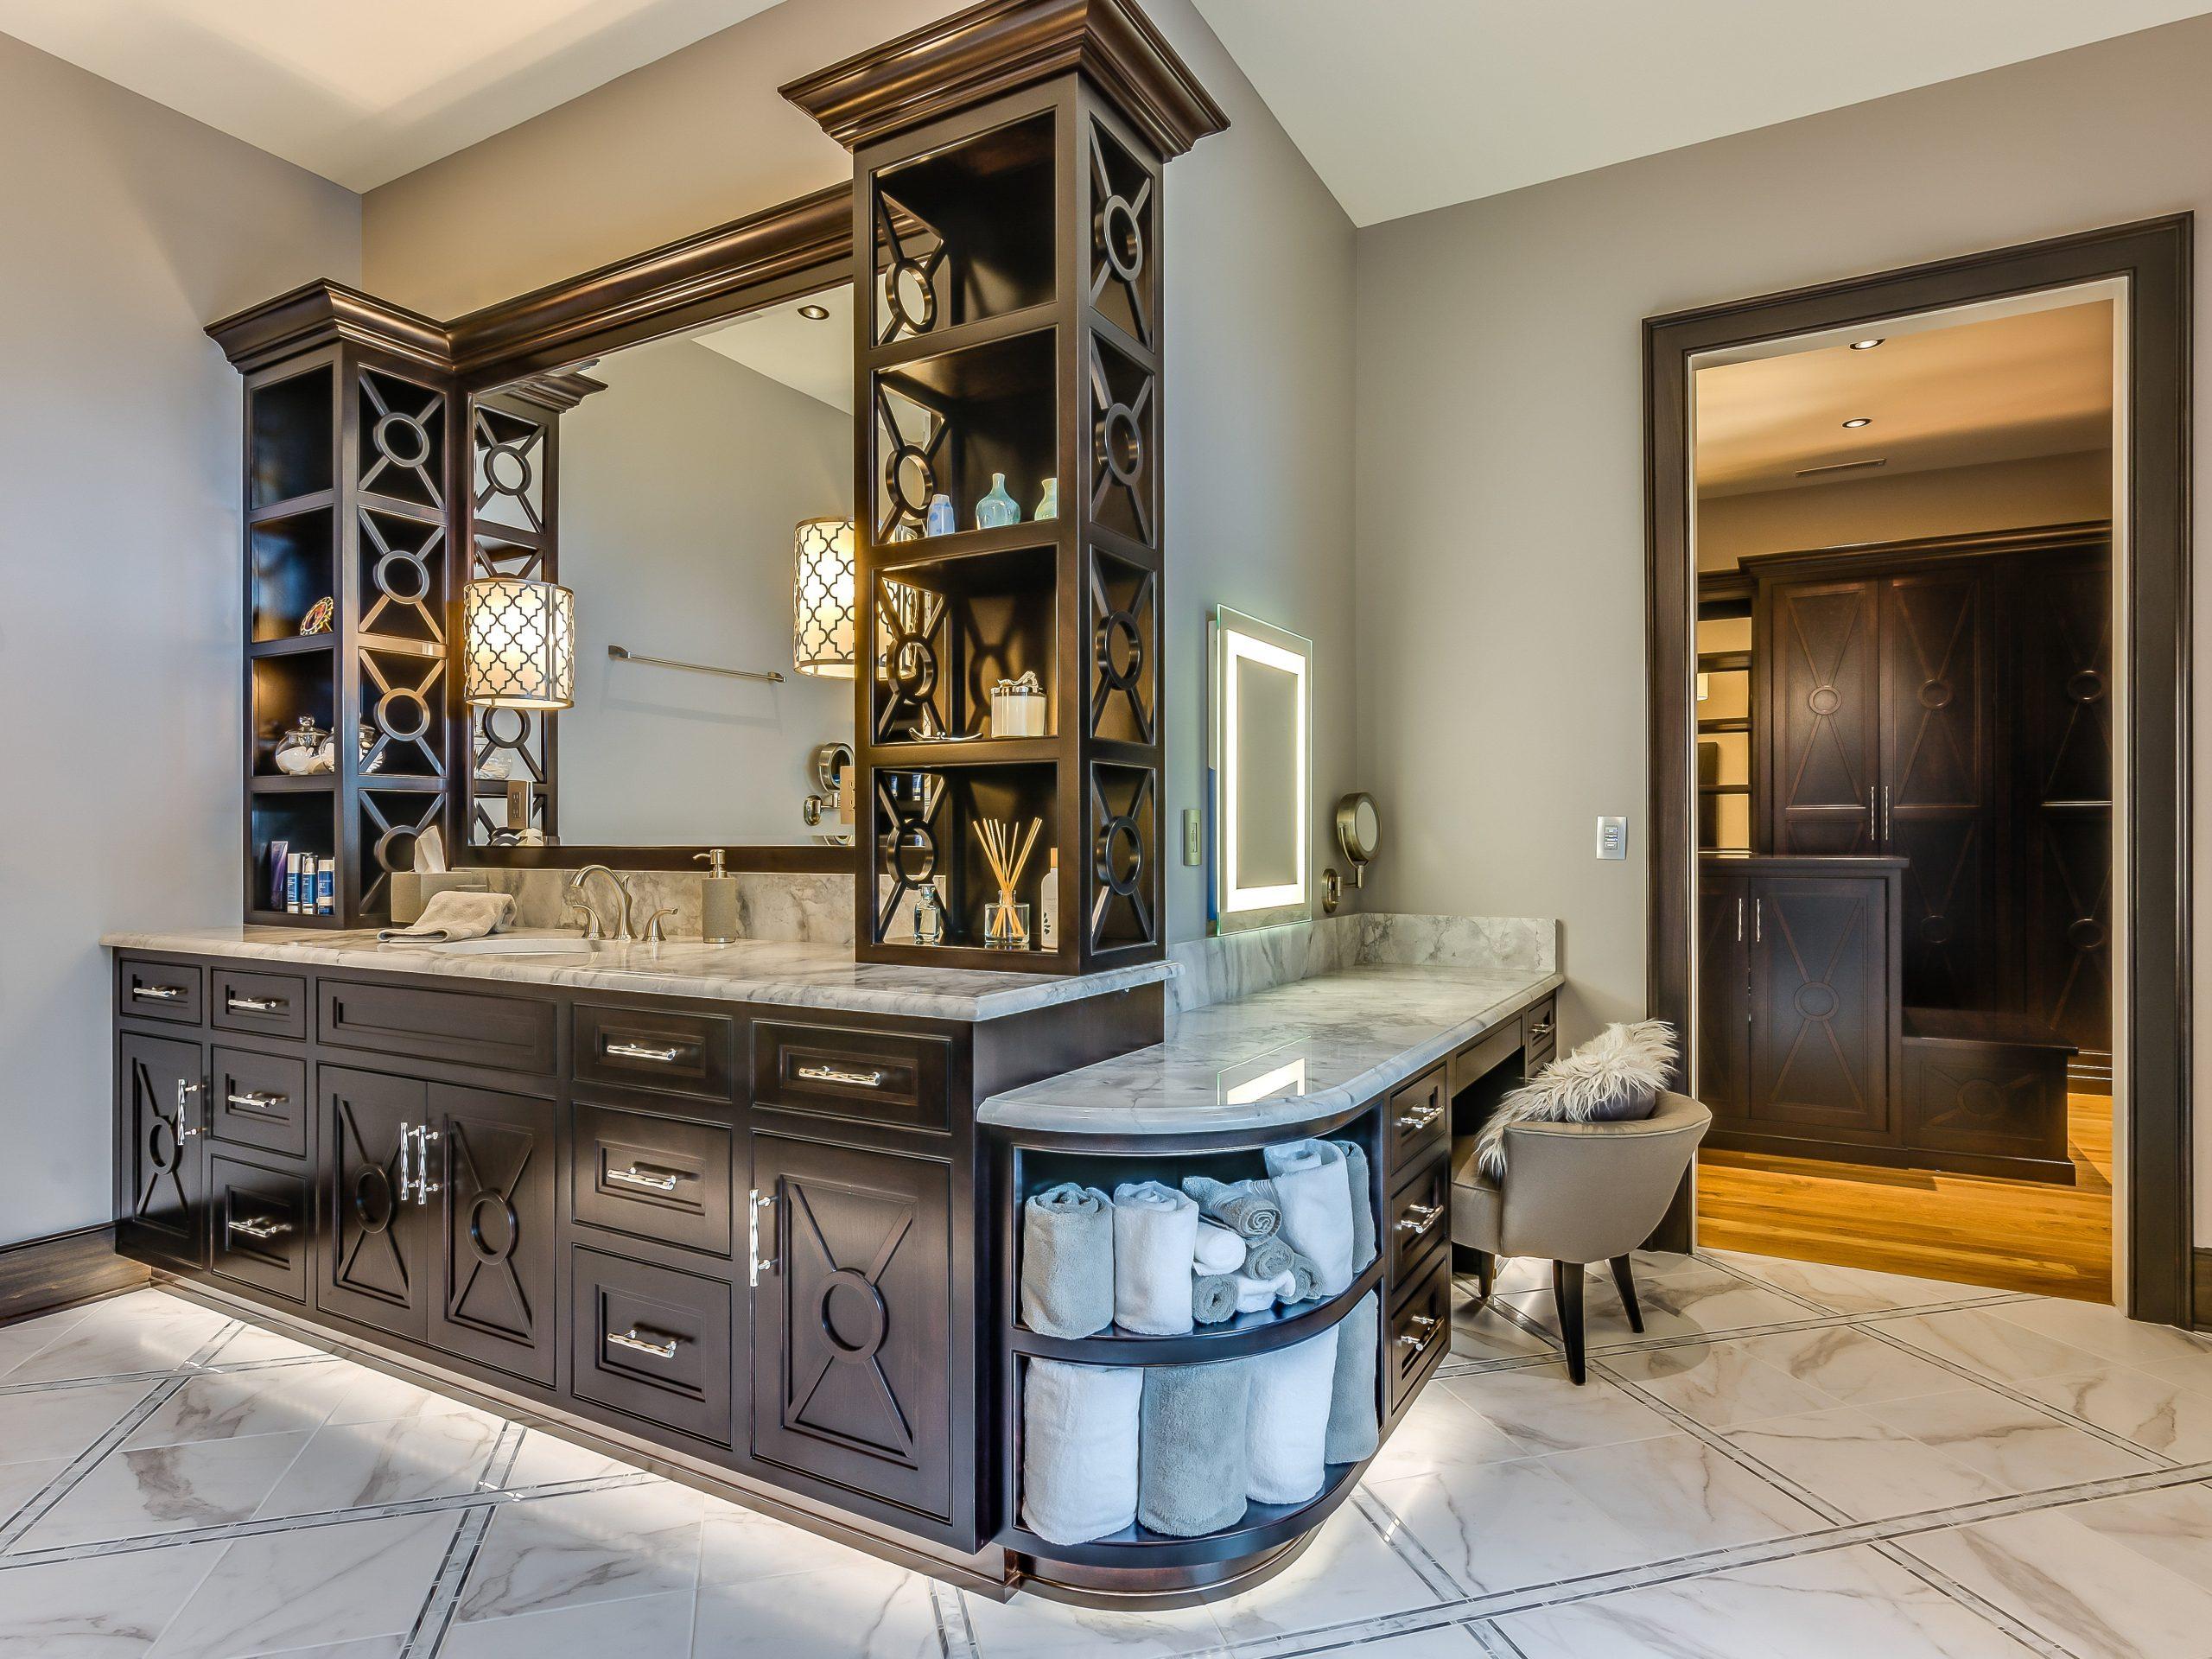 custom designed and built bathroom cabinets